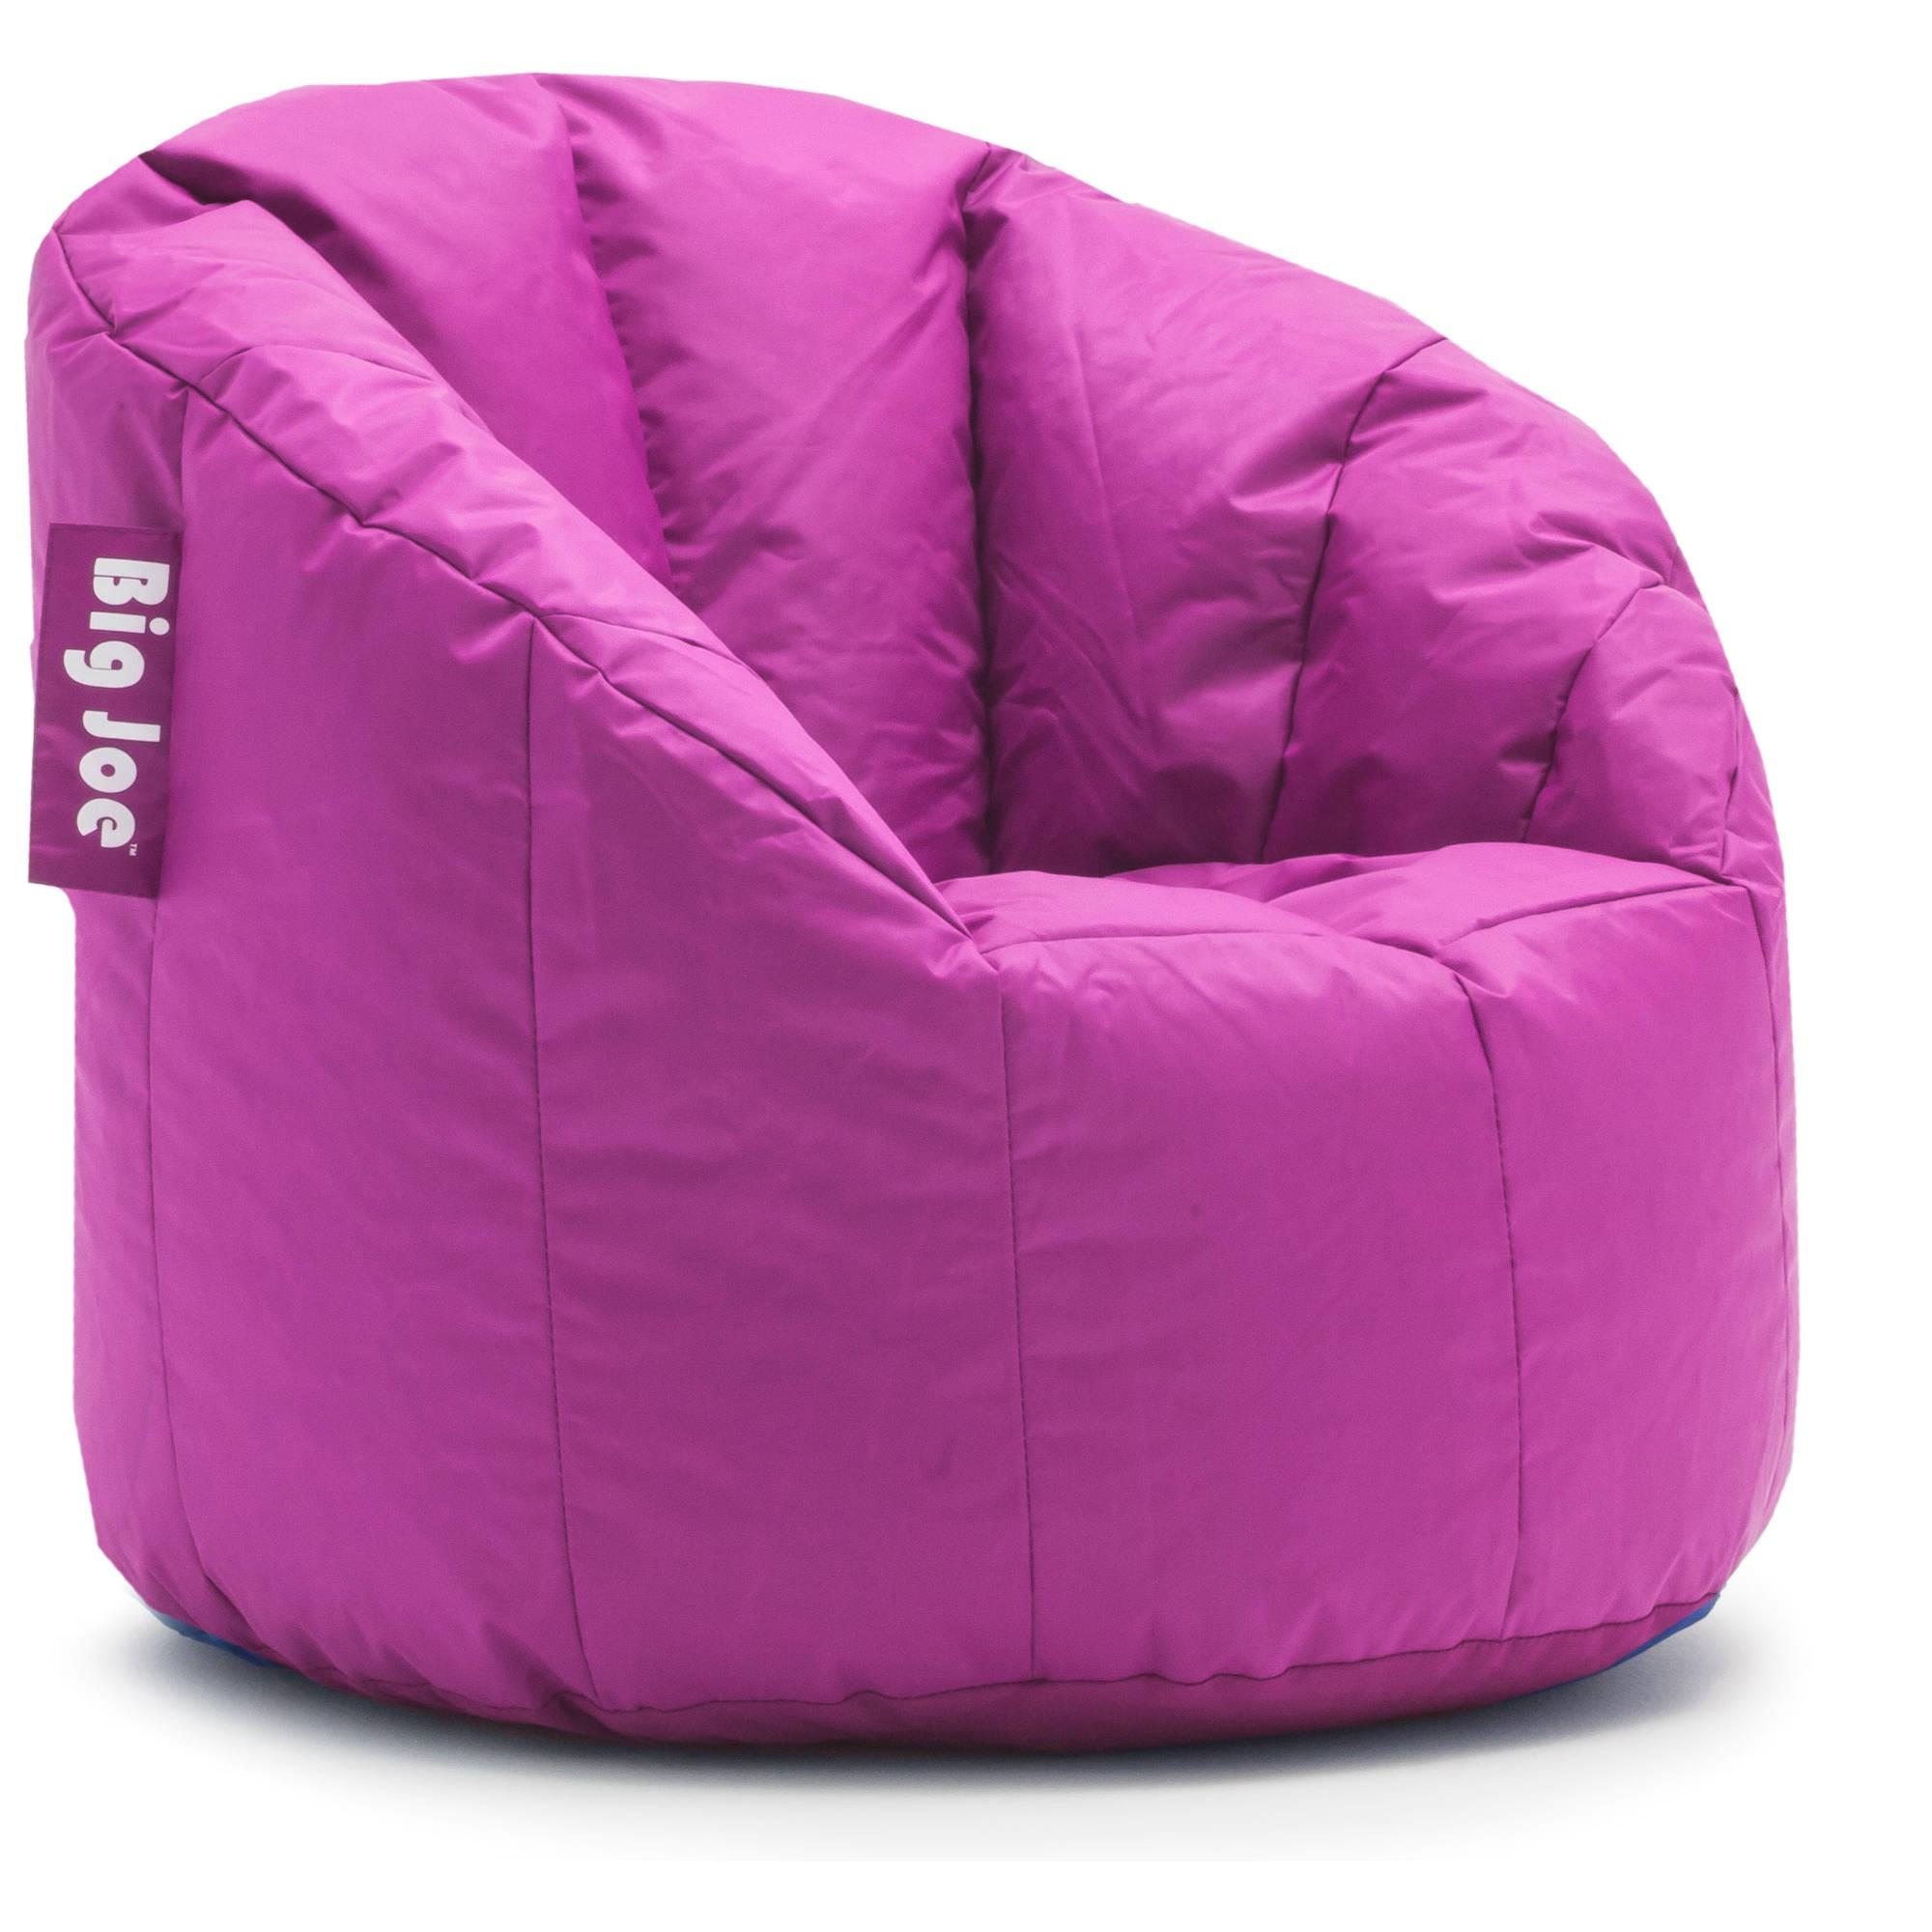 big joe milano bean bag chair multiple colors 32 x 28 x 25 walmart com